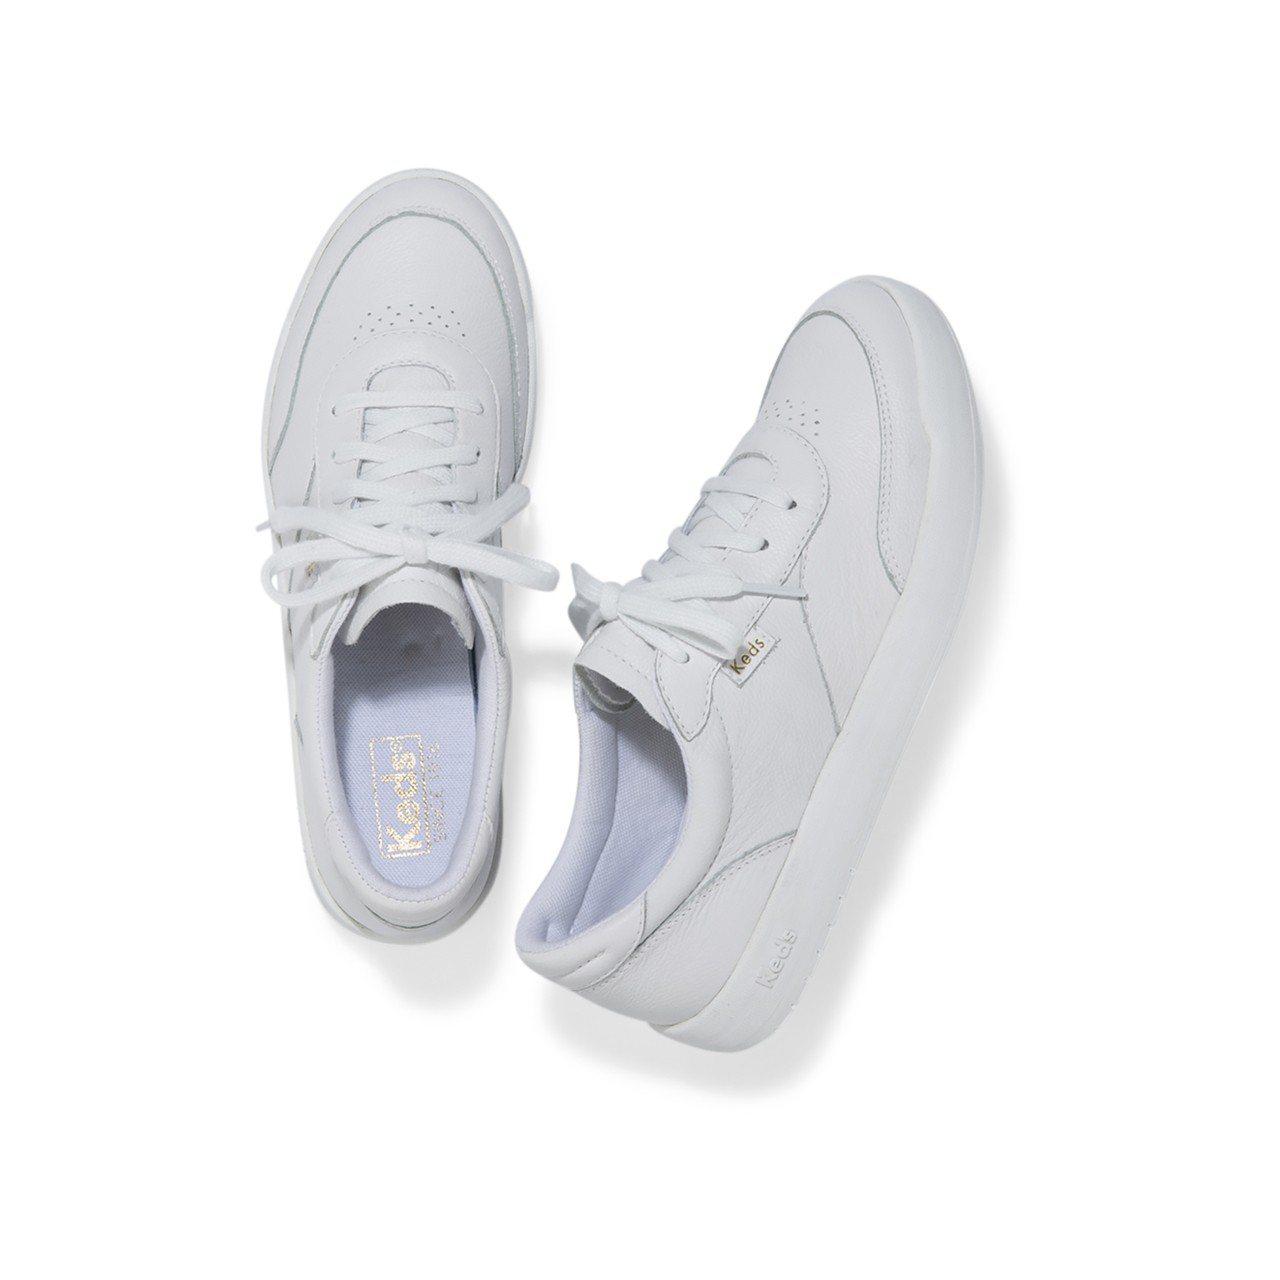 Keds Match Point系列麂皮材质鞋款,3,290元。 图/Keds提供